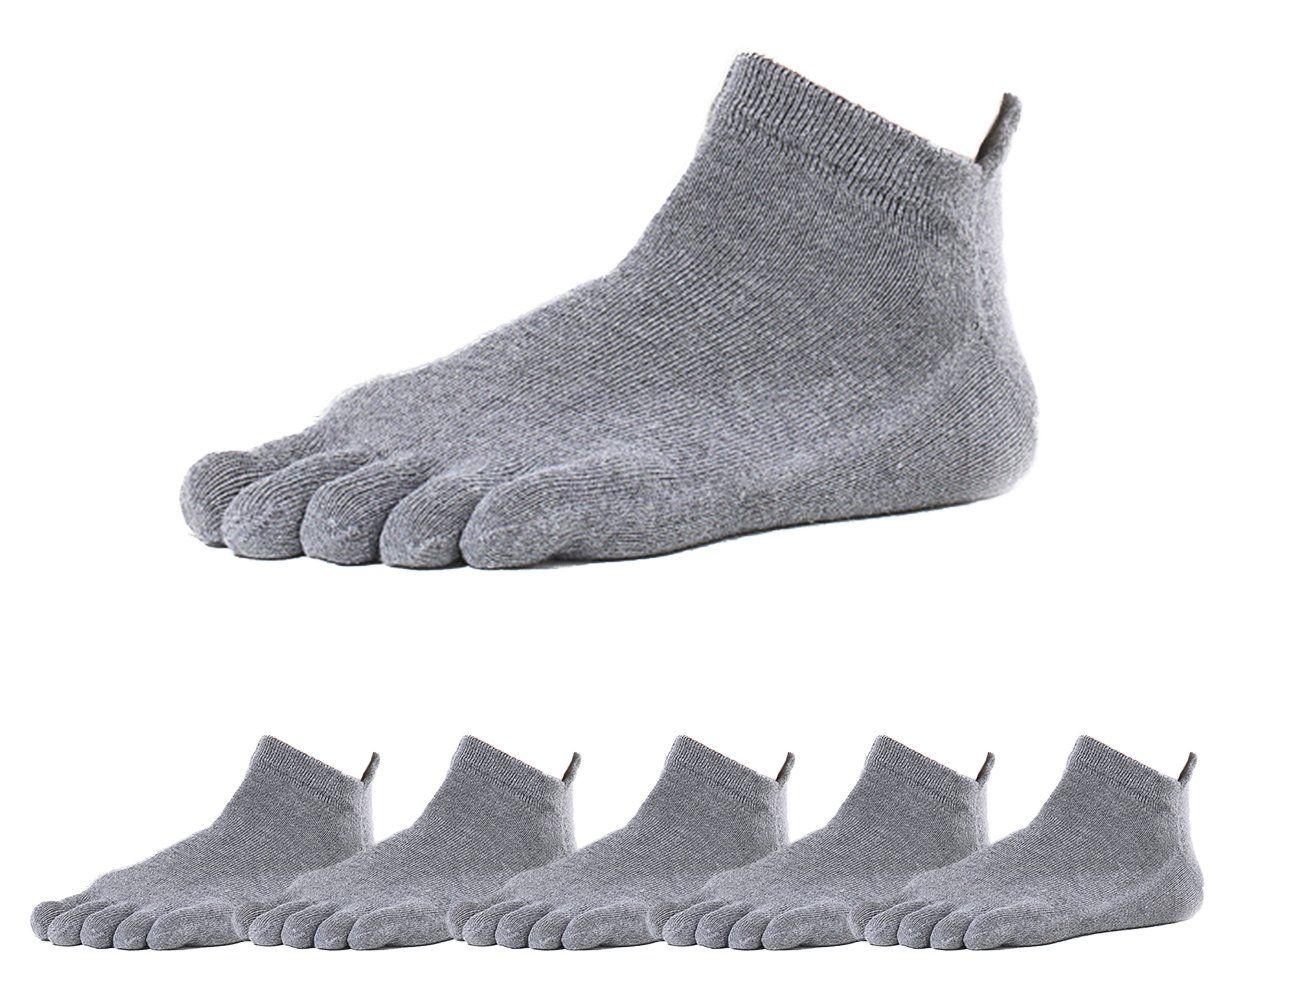 6e3545f11a54f GEOOT 5 Pair Solid Color Men Five Fingers Toe Socks Size 612 Gray ...